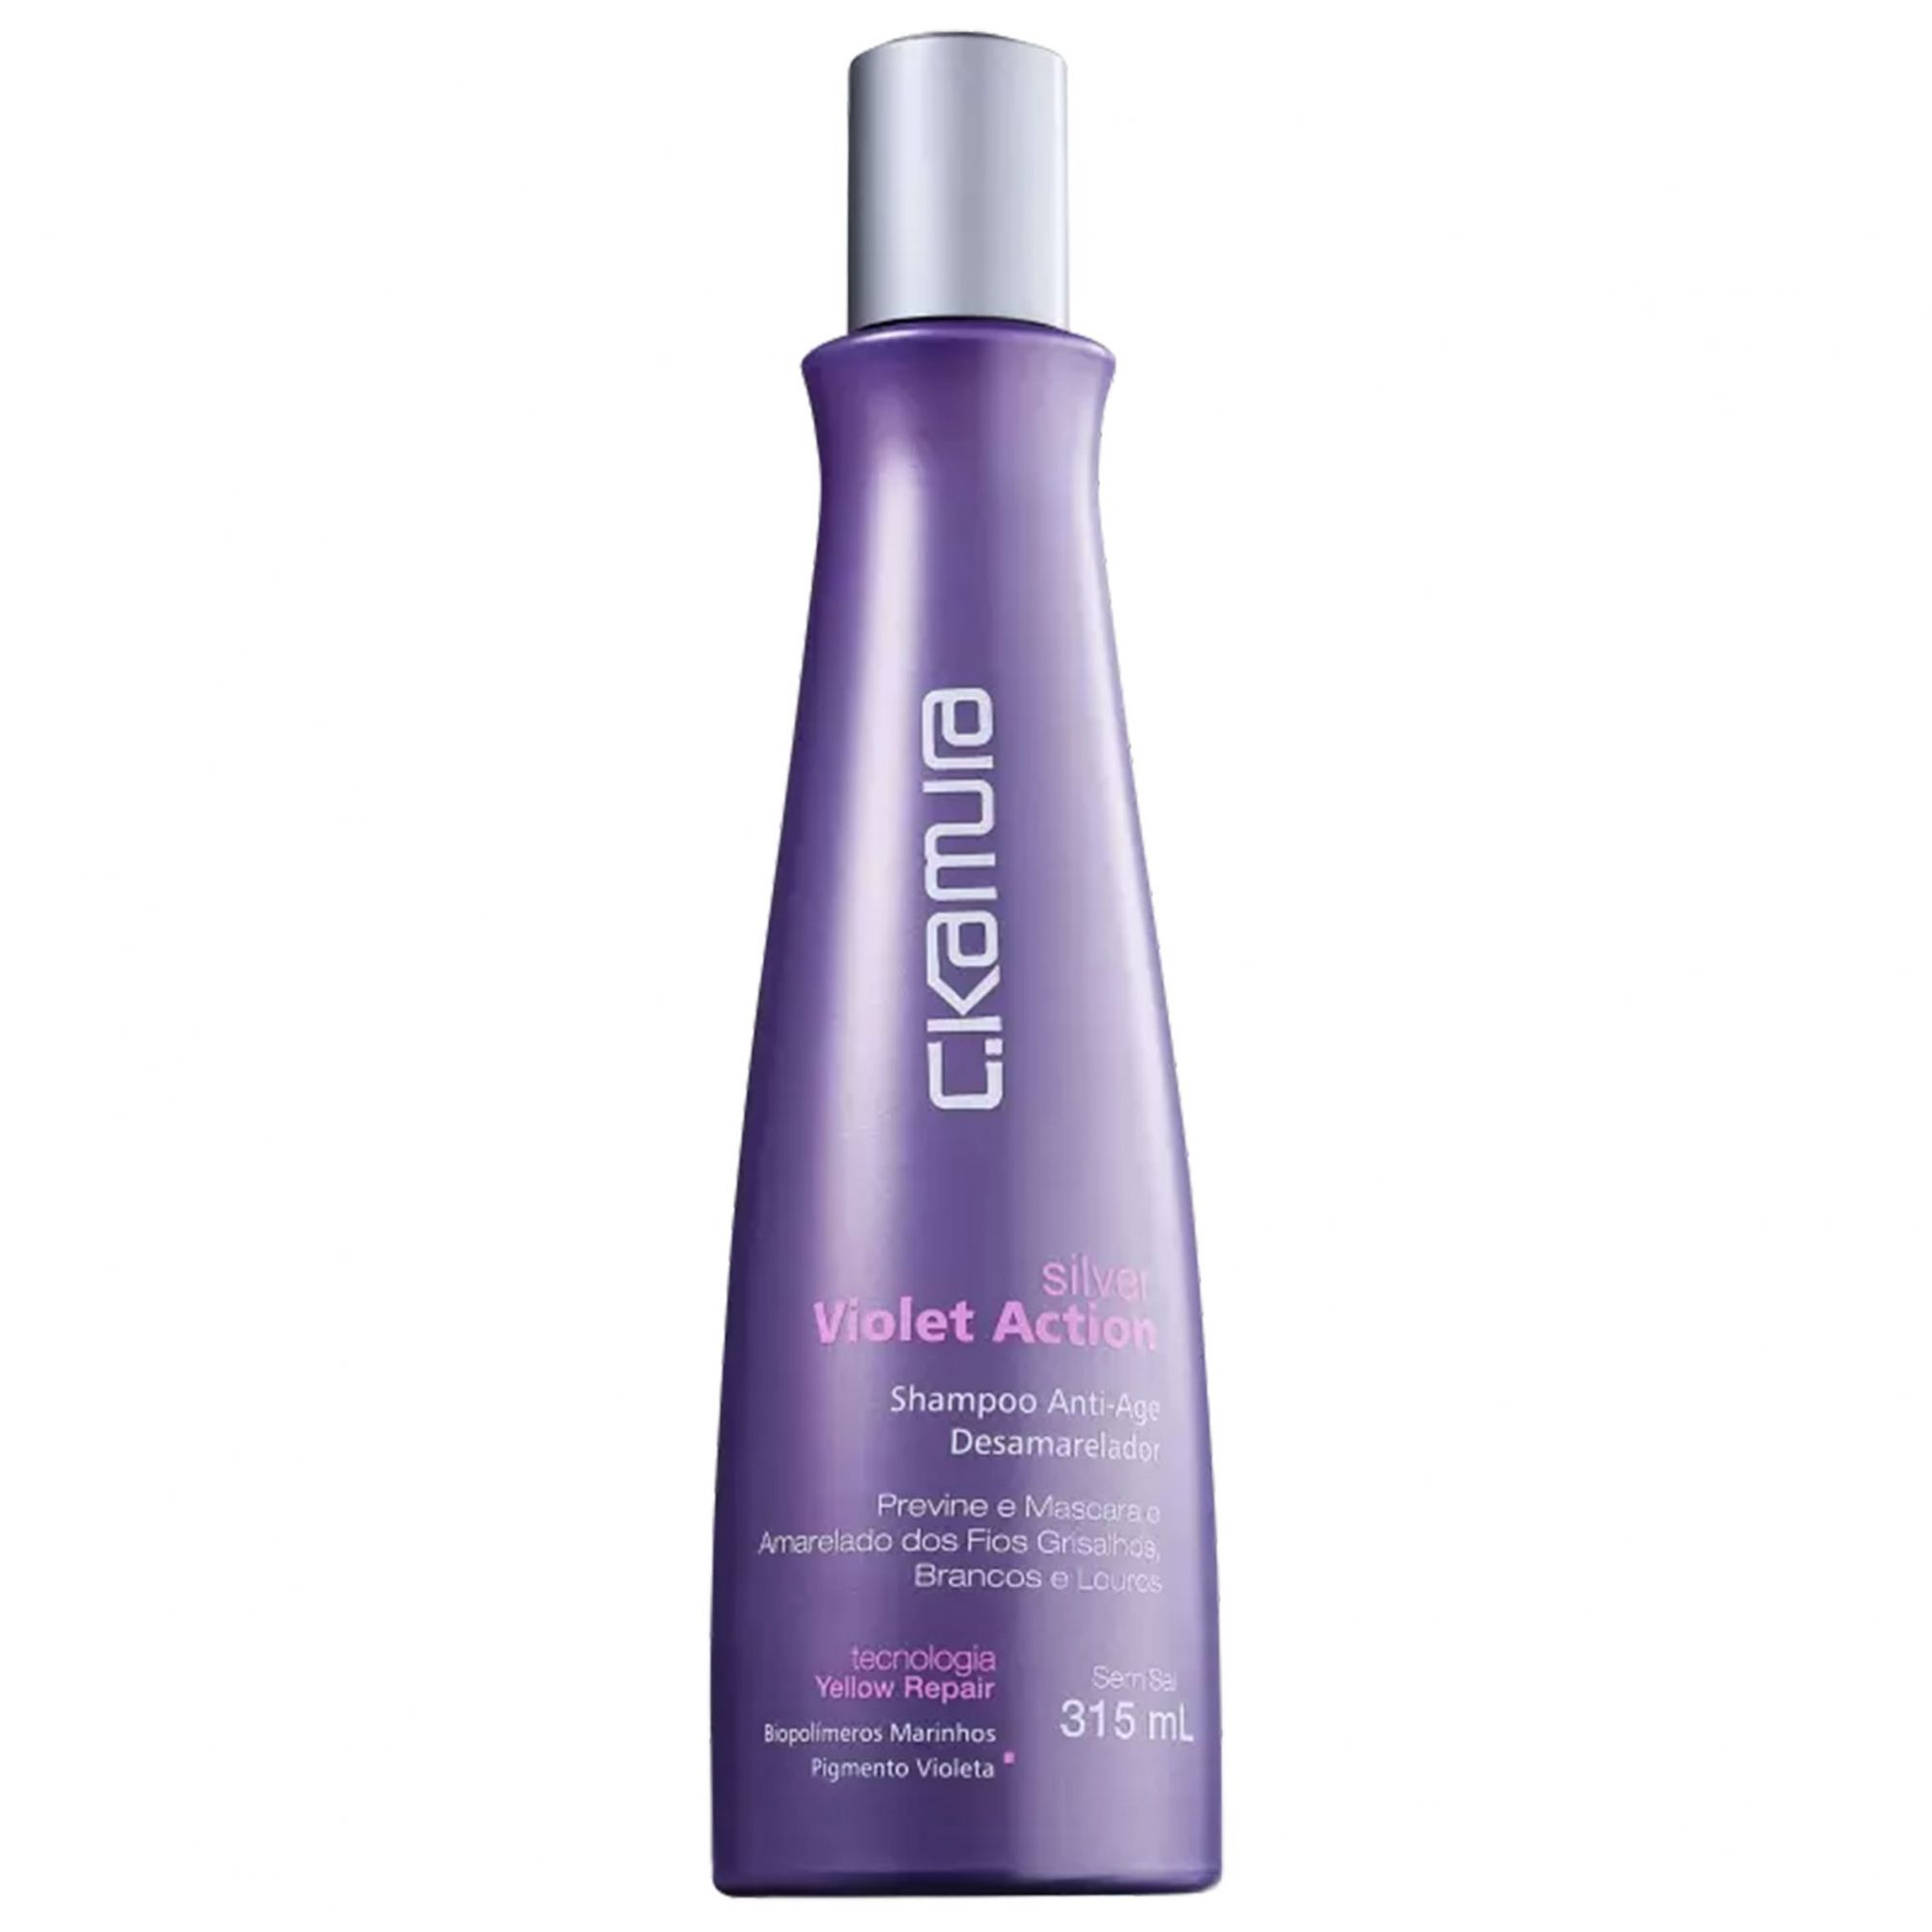 C.Kamura Silver Violet Action - Shampoo Desamarelador 315ml.